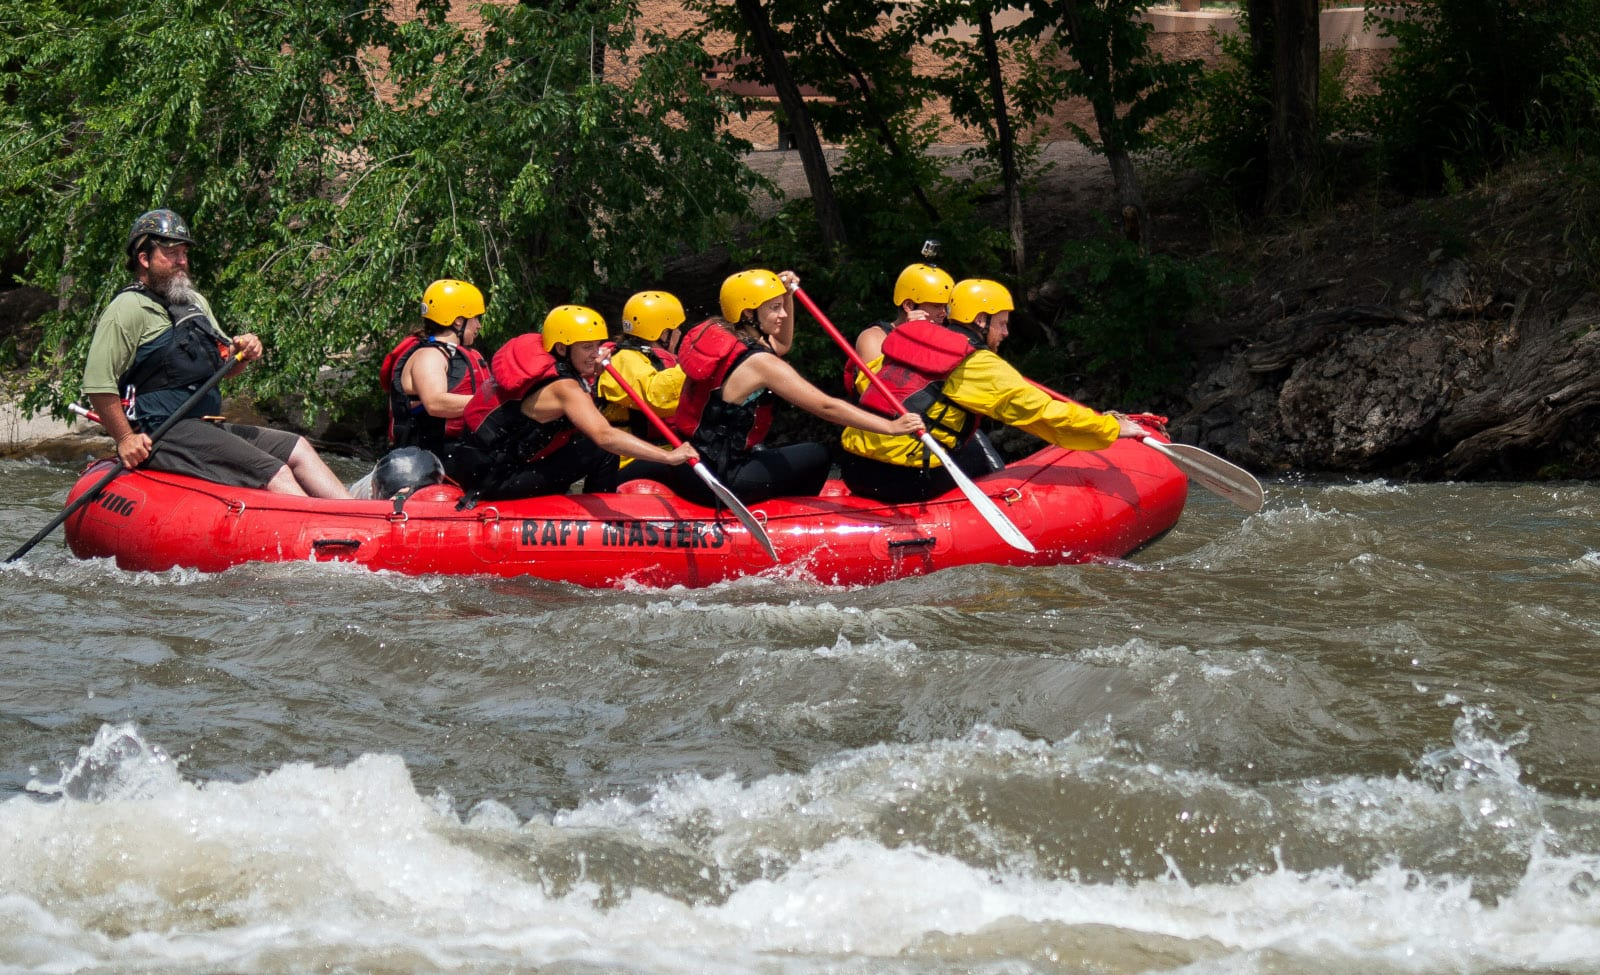 Colorado Watersports Royal Gorge Whitewater Rafting